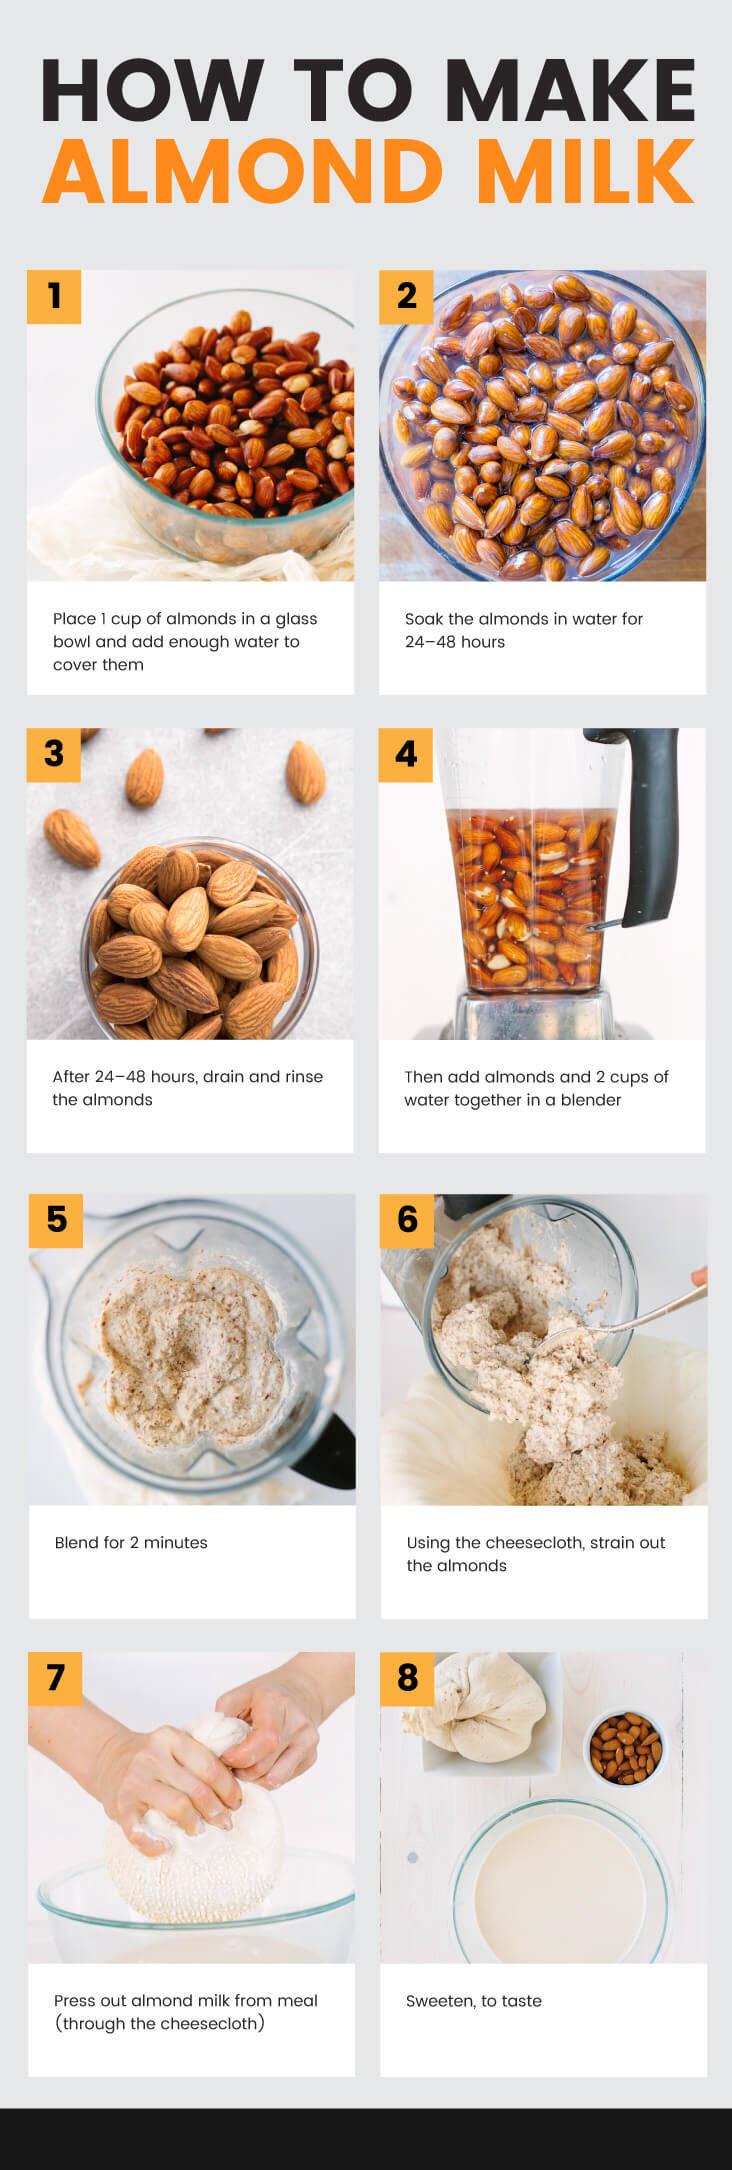 How to make milk- MKexpress.net